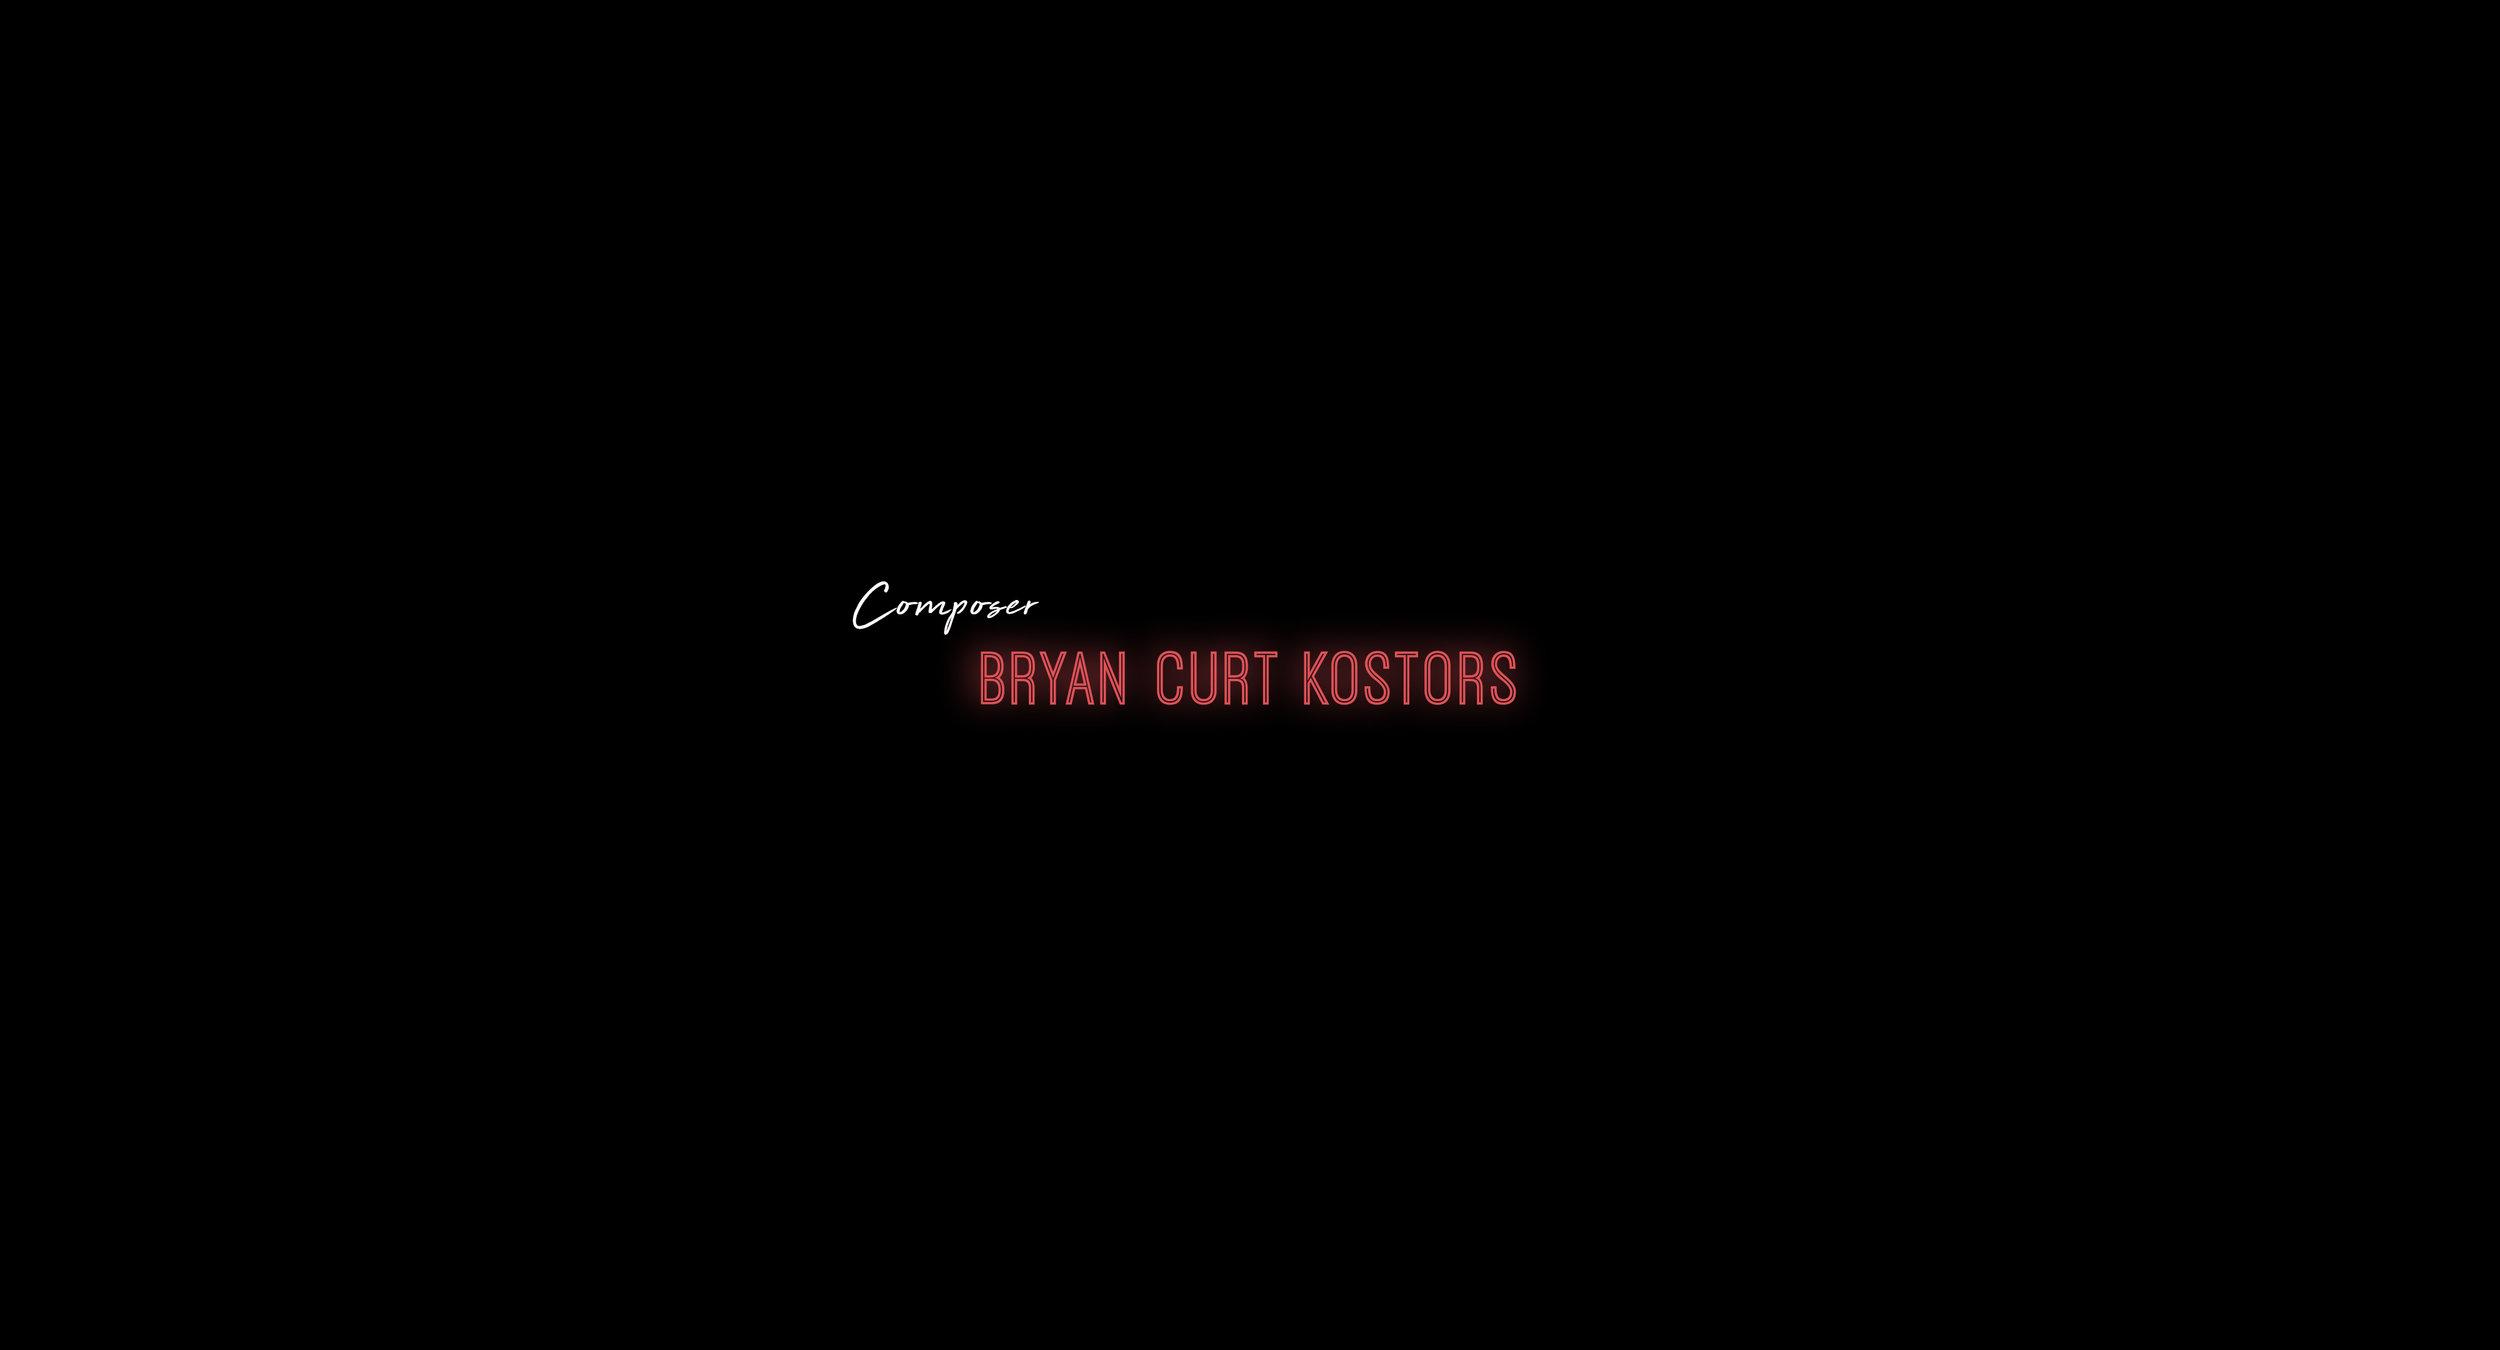 Bryan Film GFX 1.jpg